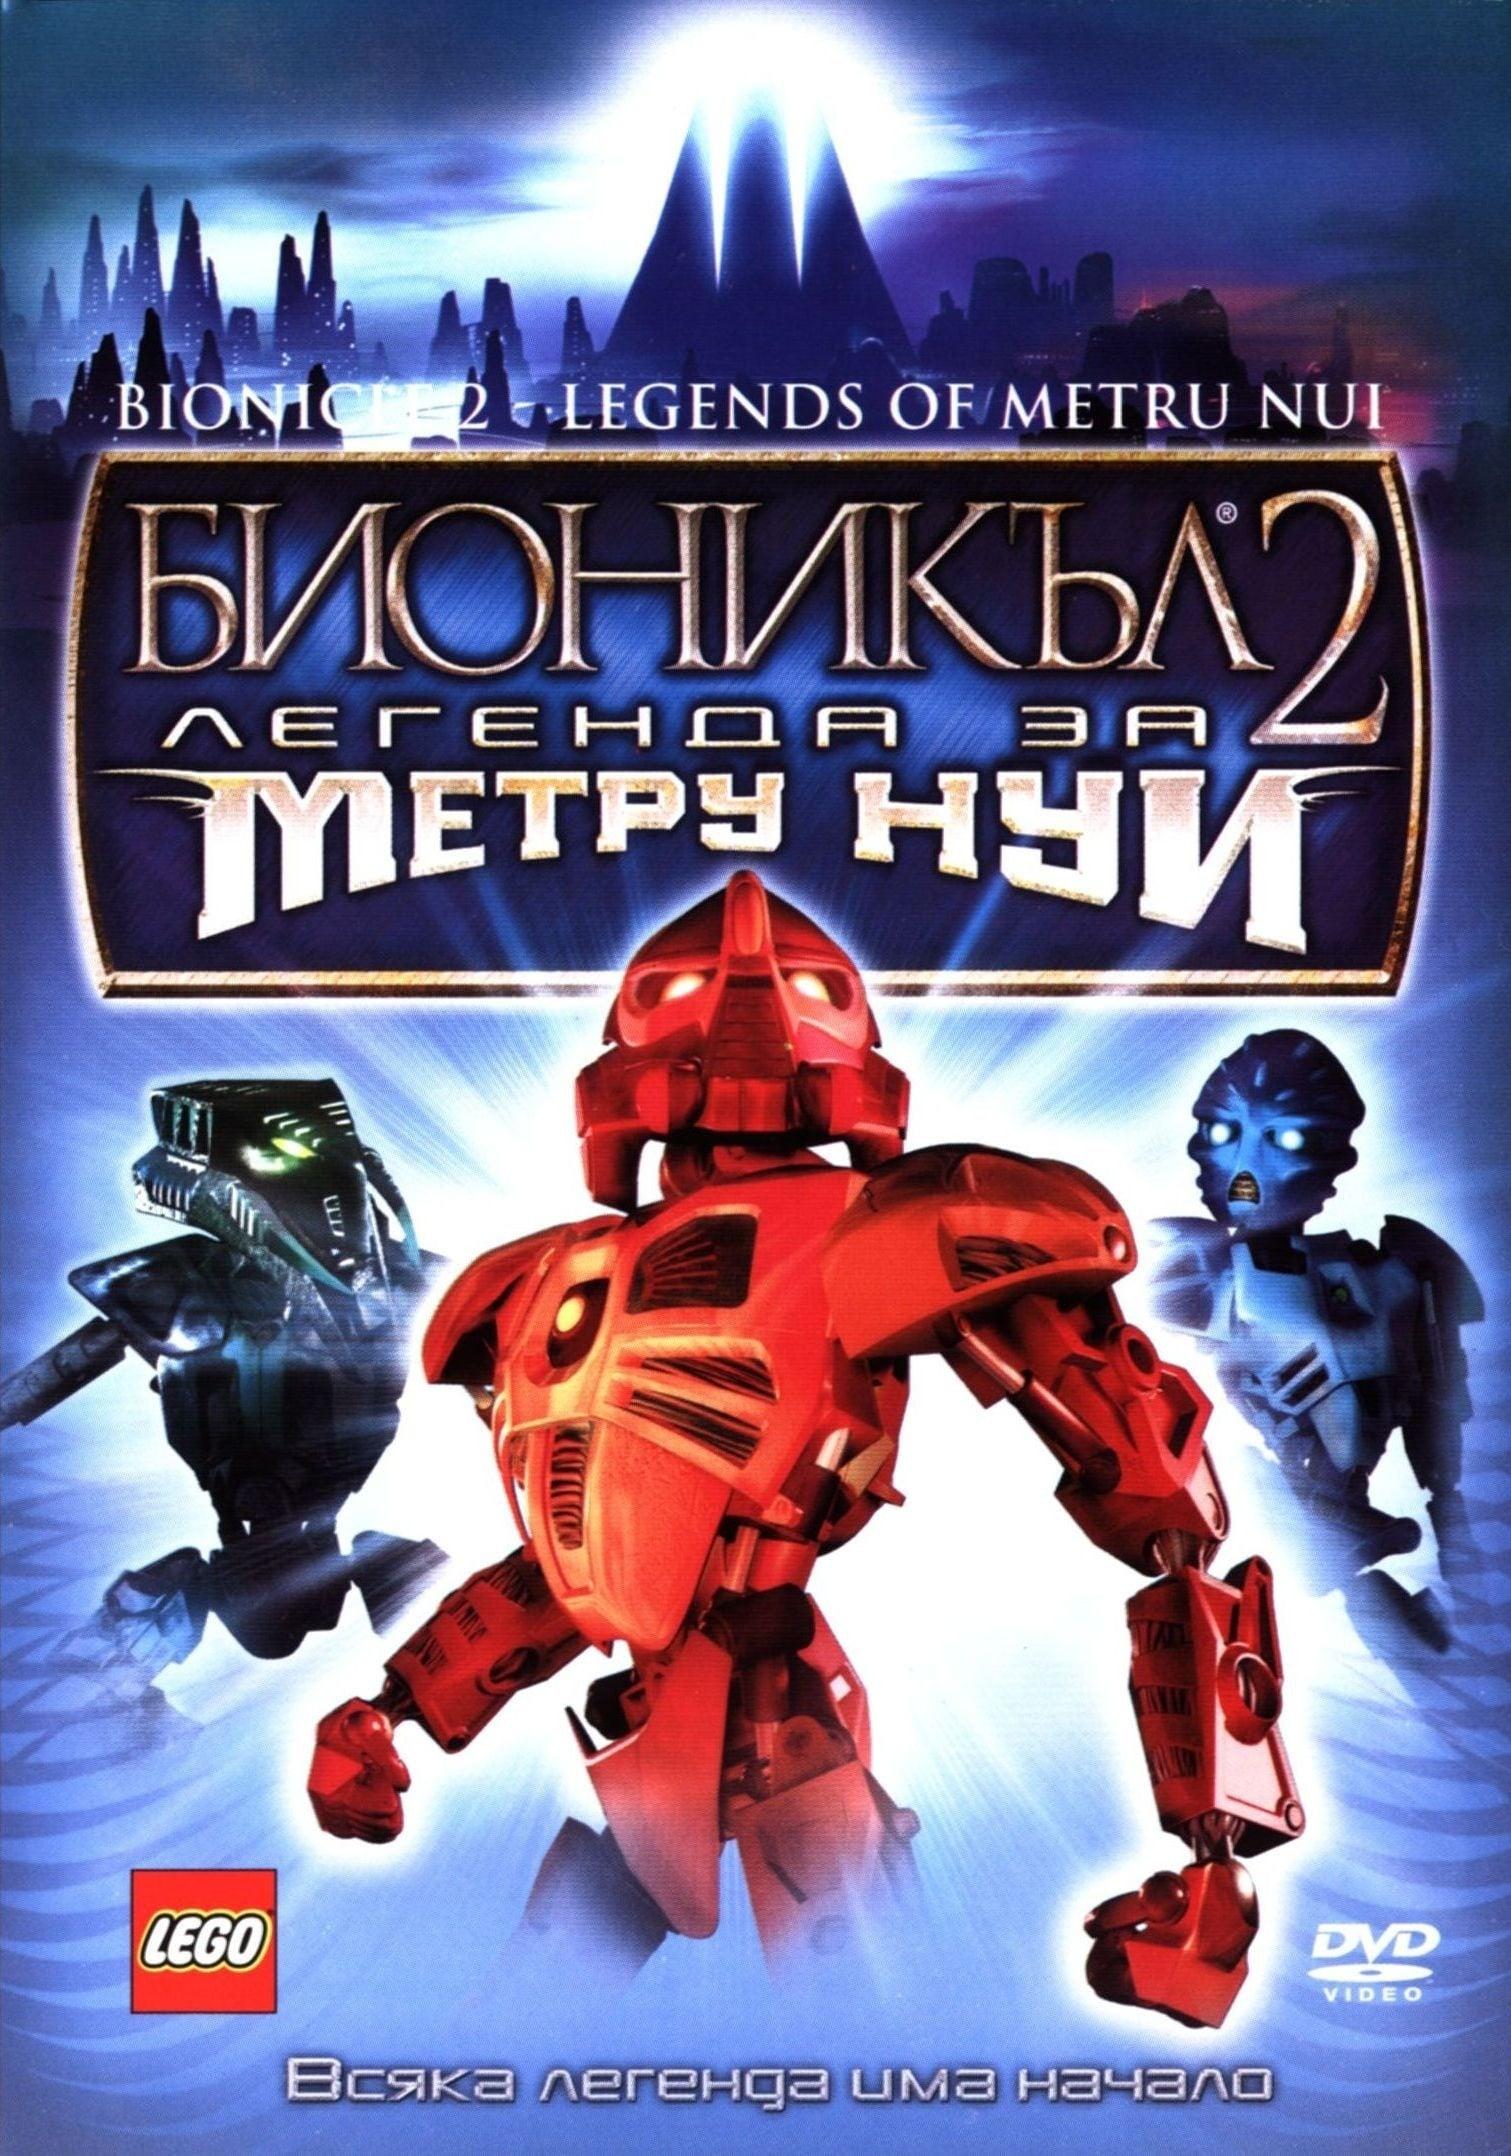 Bionicle 2: Legends of Metru Nui Trailer